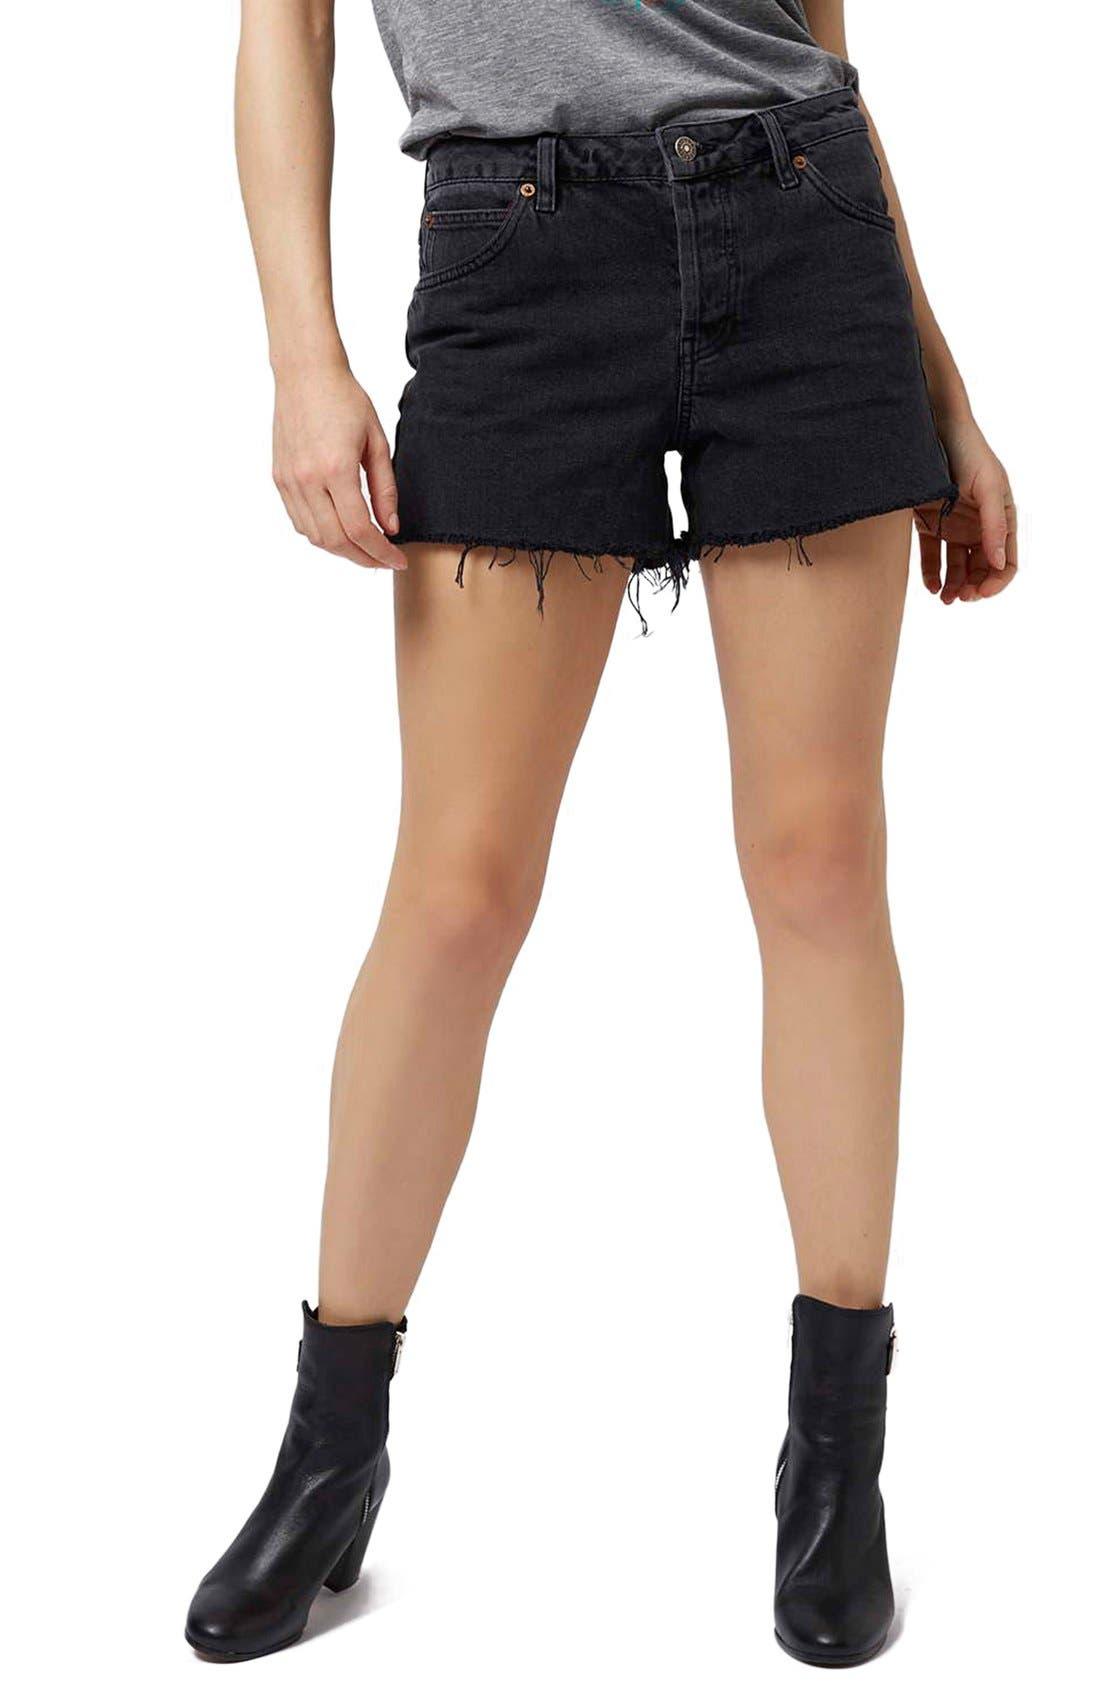 Main Image - Topshop 'Ashley' Black Denim Cutoff Shorts